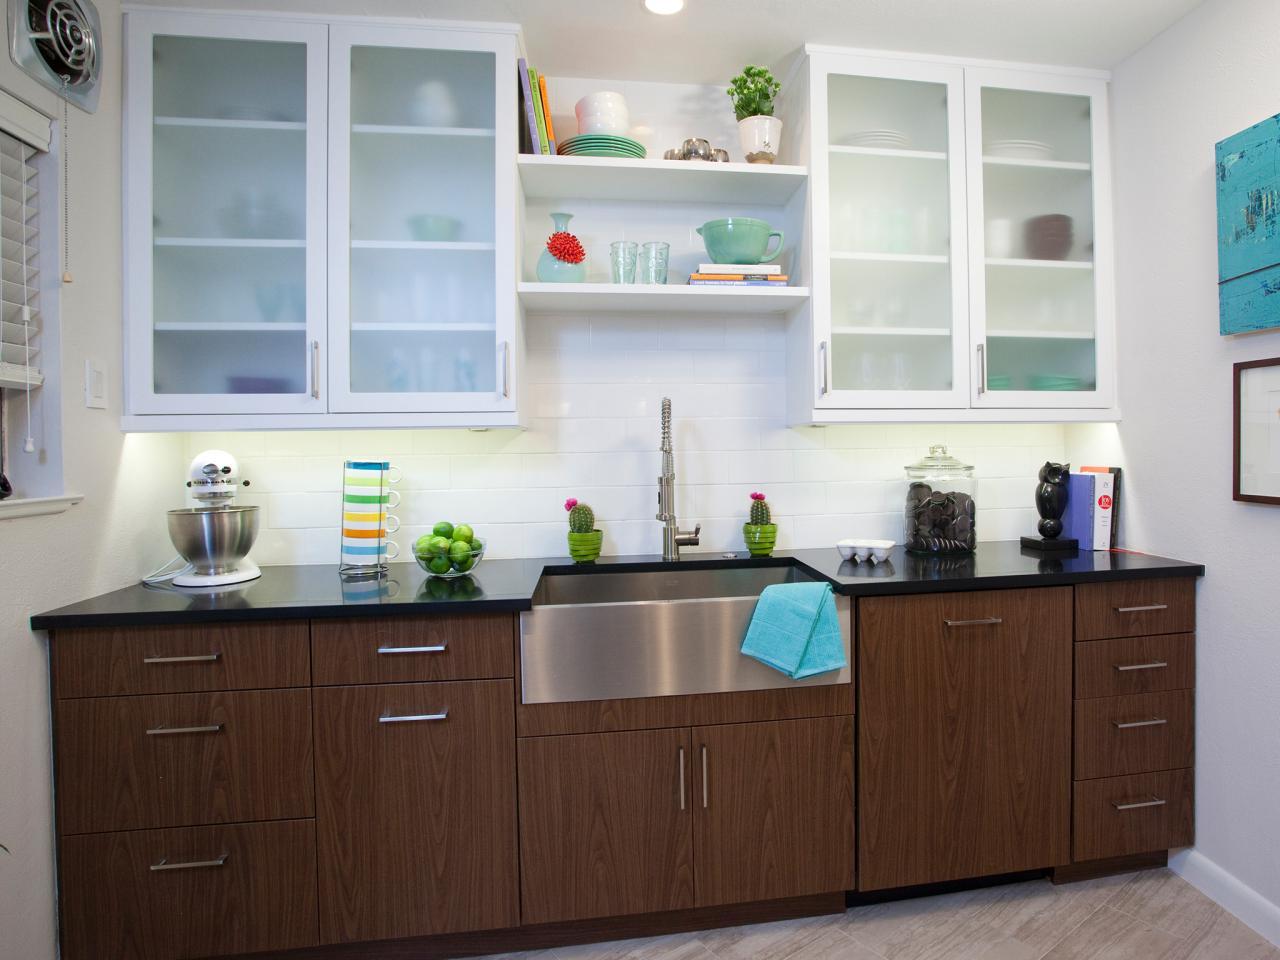 kitchen cabinets design cream color country style kitchen ZKXWUCM